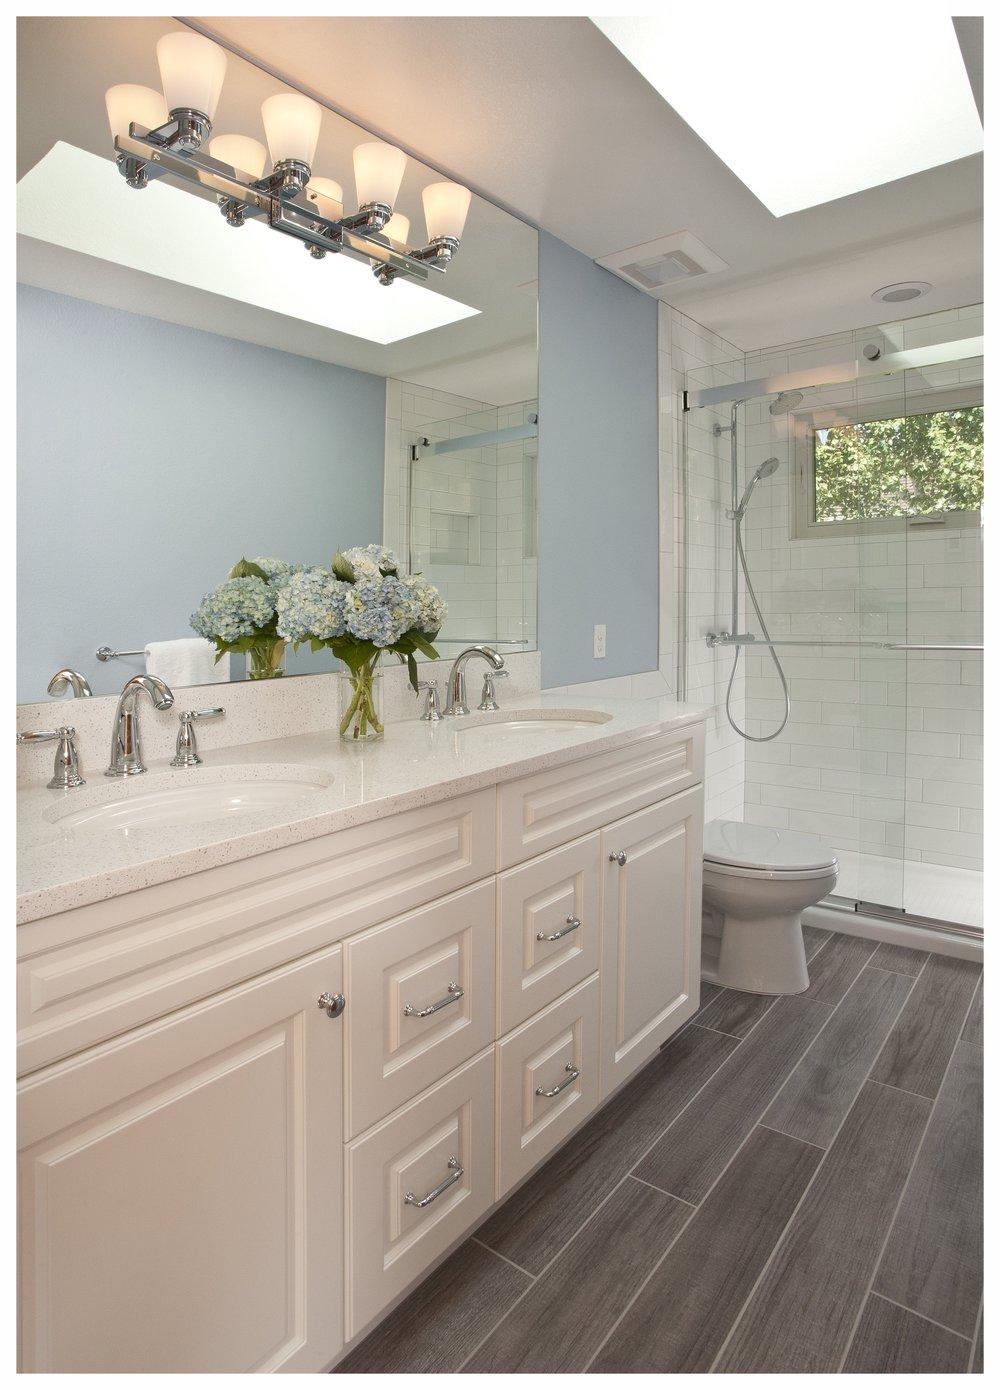 Bellevue Lakemont Tradational Small Bath 1.jpg